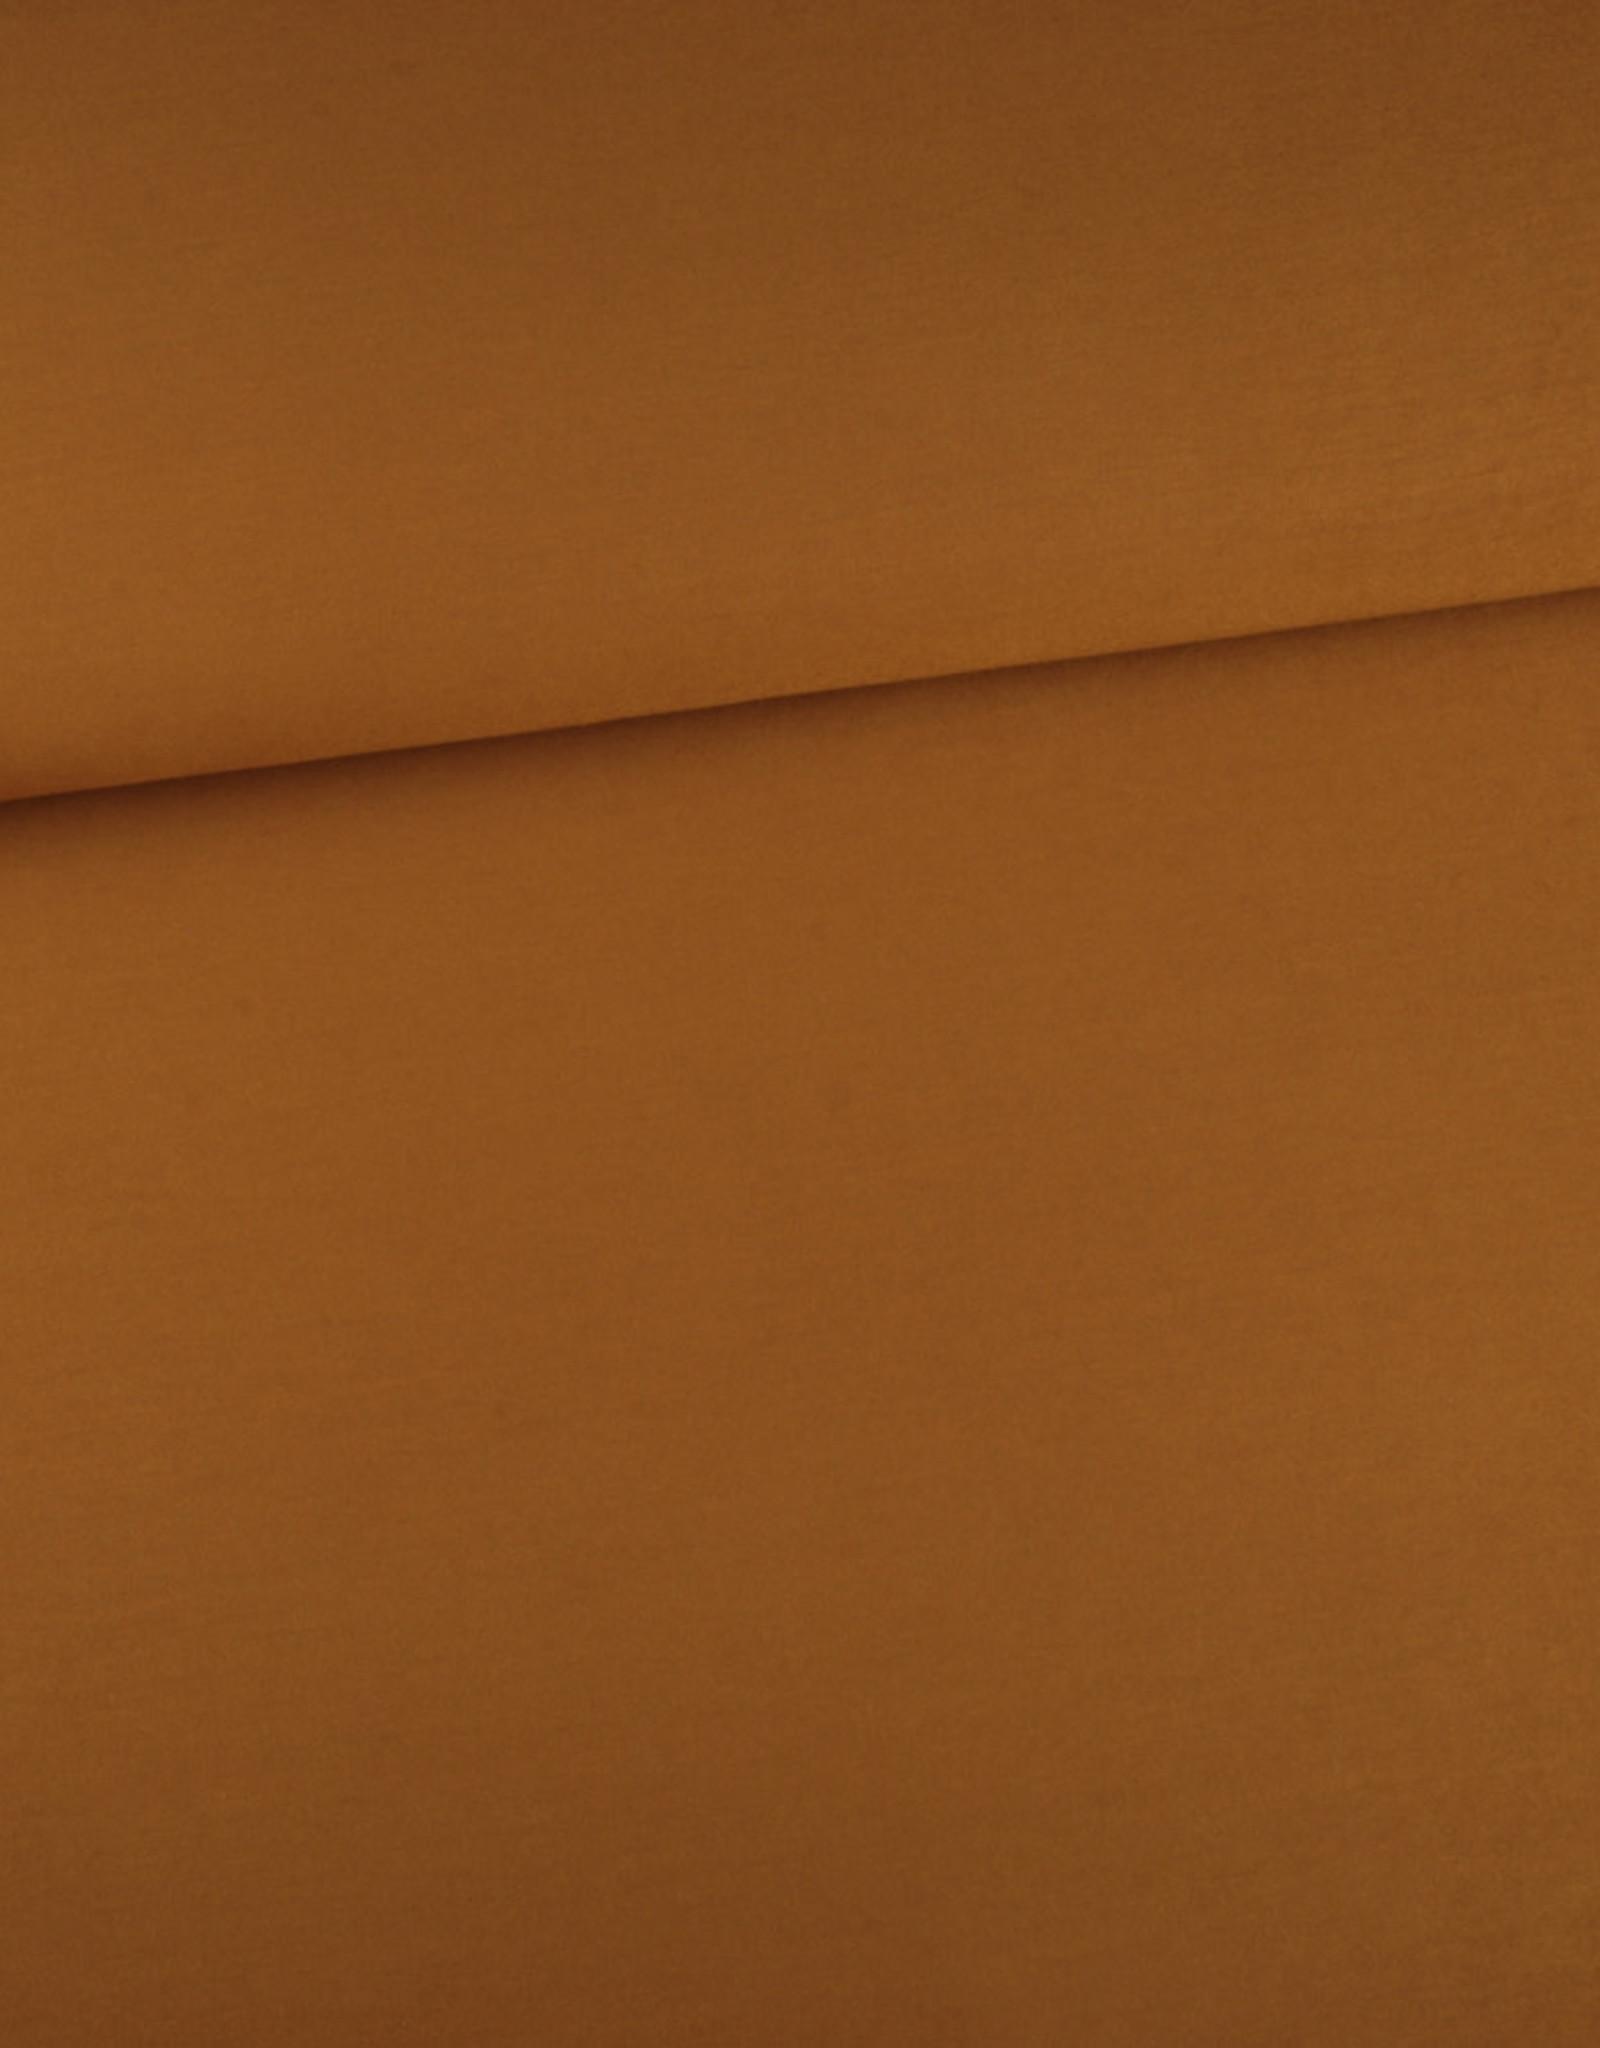 Editex Uni tencel modal jersey bruin/oker